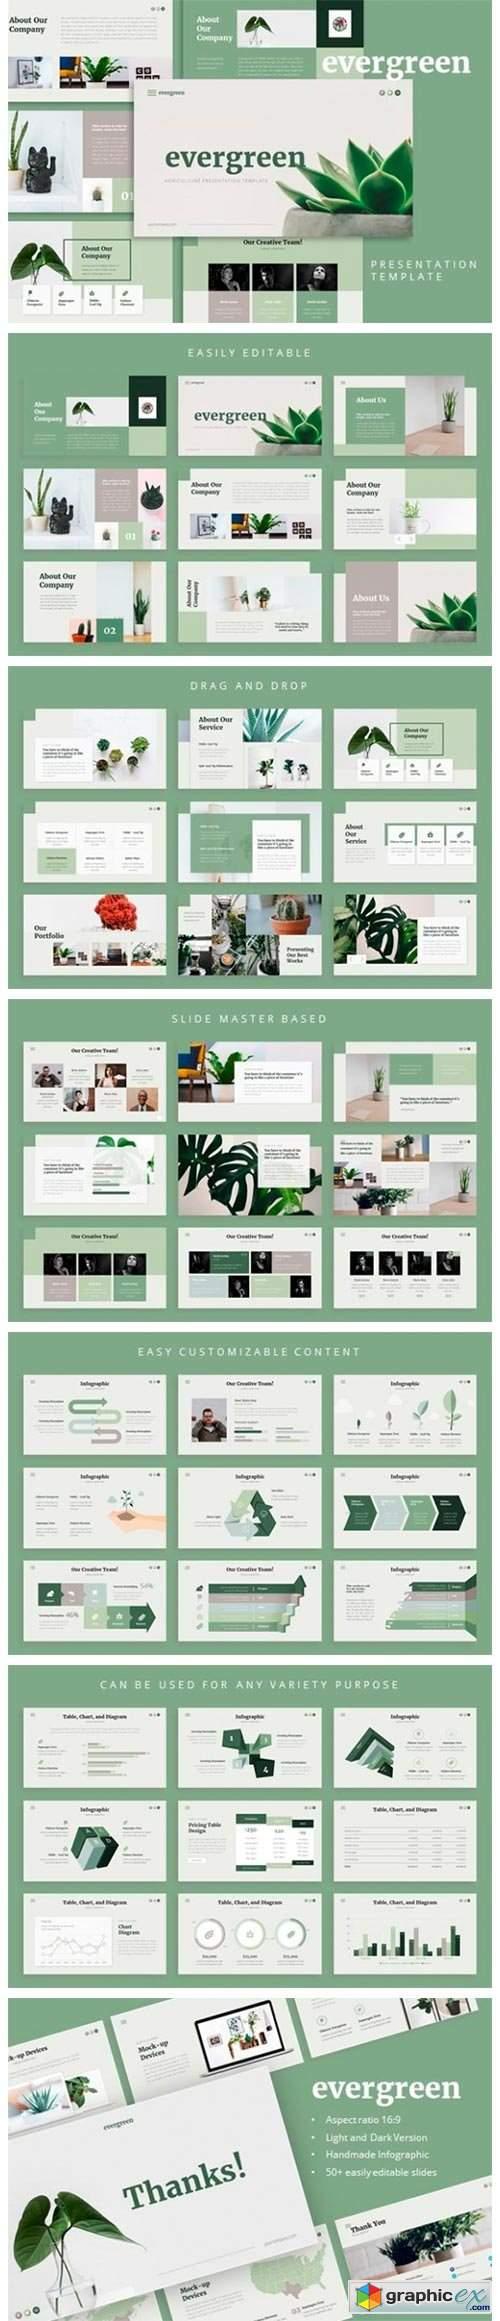 Evergreen PowerPoint Template